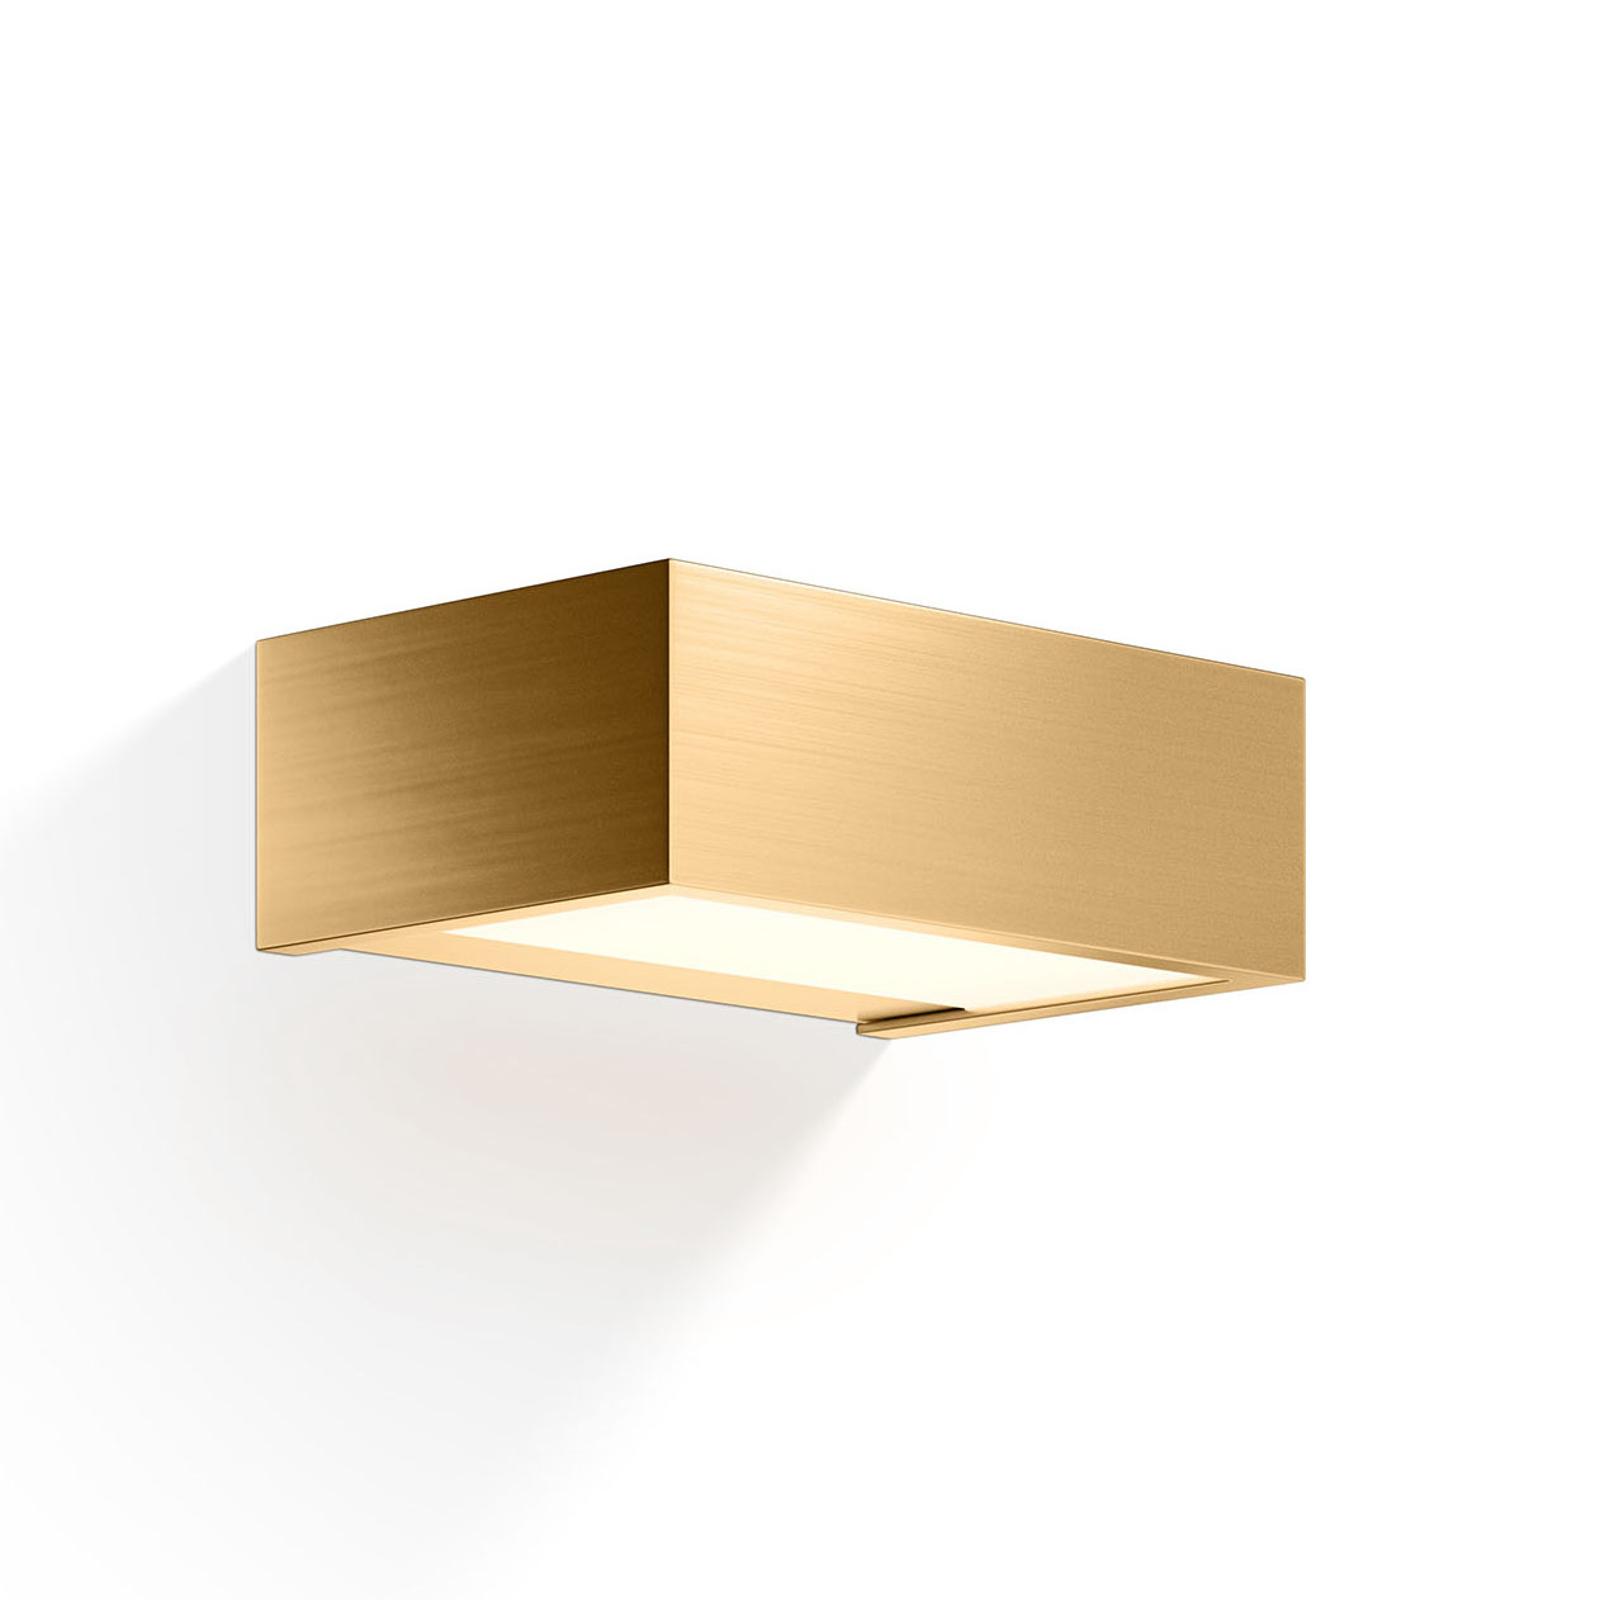 Decor Walther Box LED-væglampe guld 2700 K 15 cm